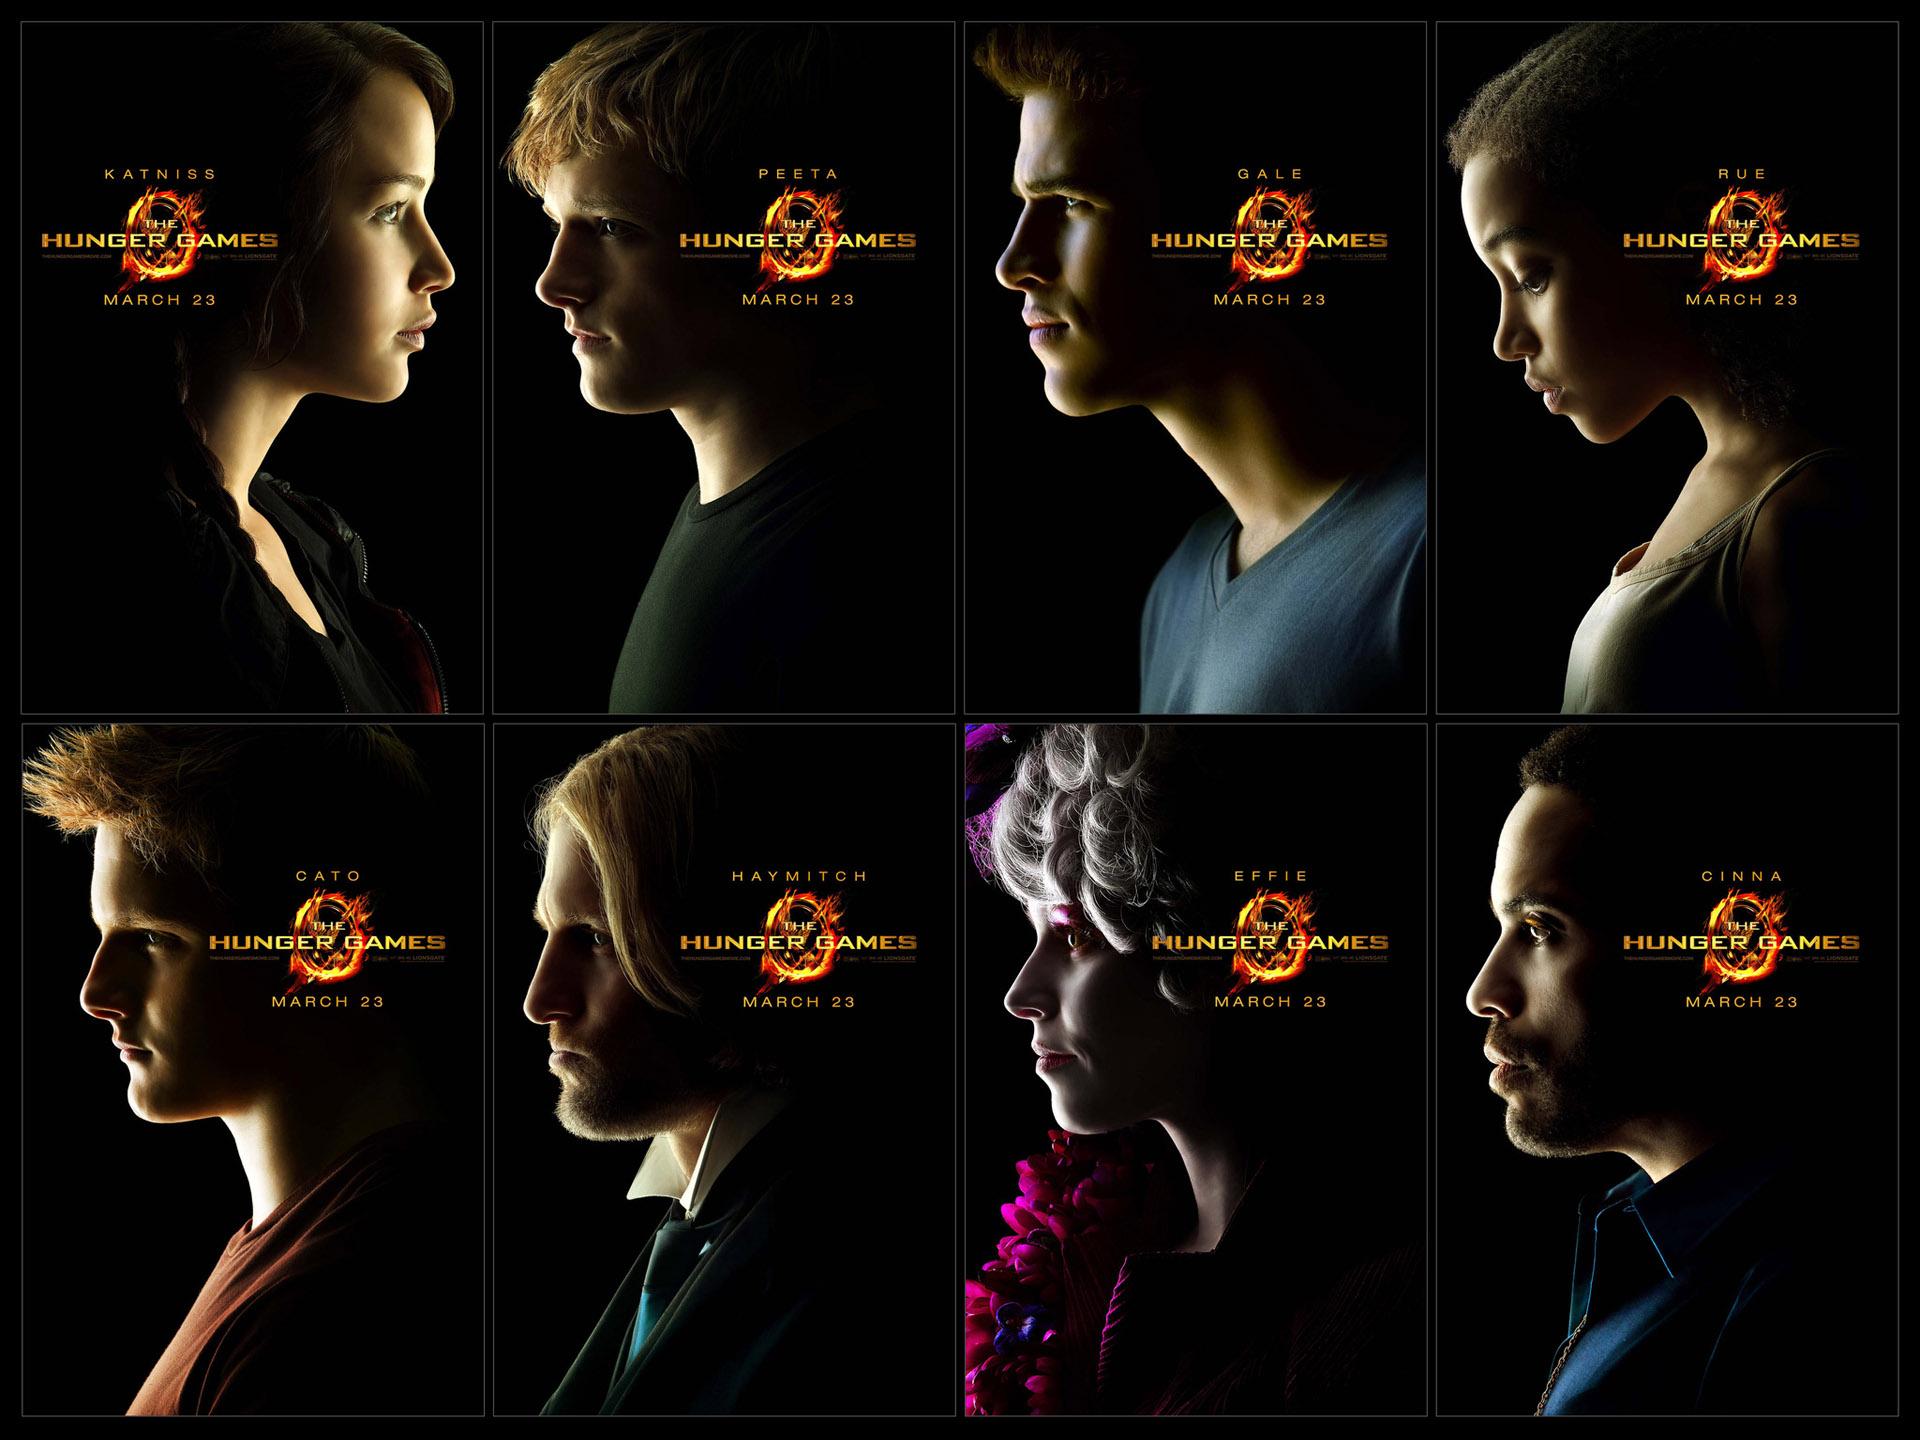 The Hunger Games Wallpaper   The Hunger Games Wallpaper 30620695 1920x1440